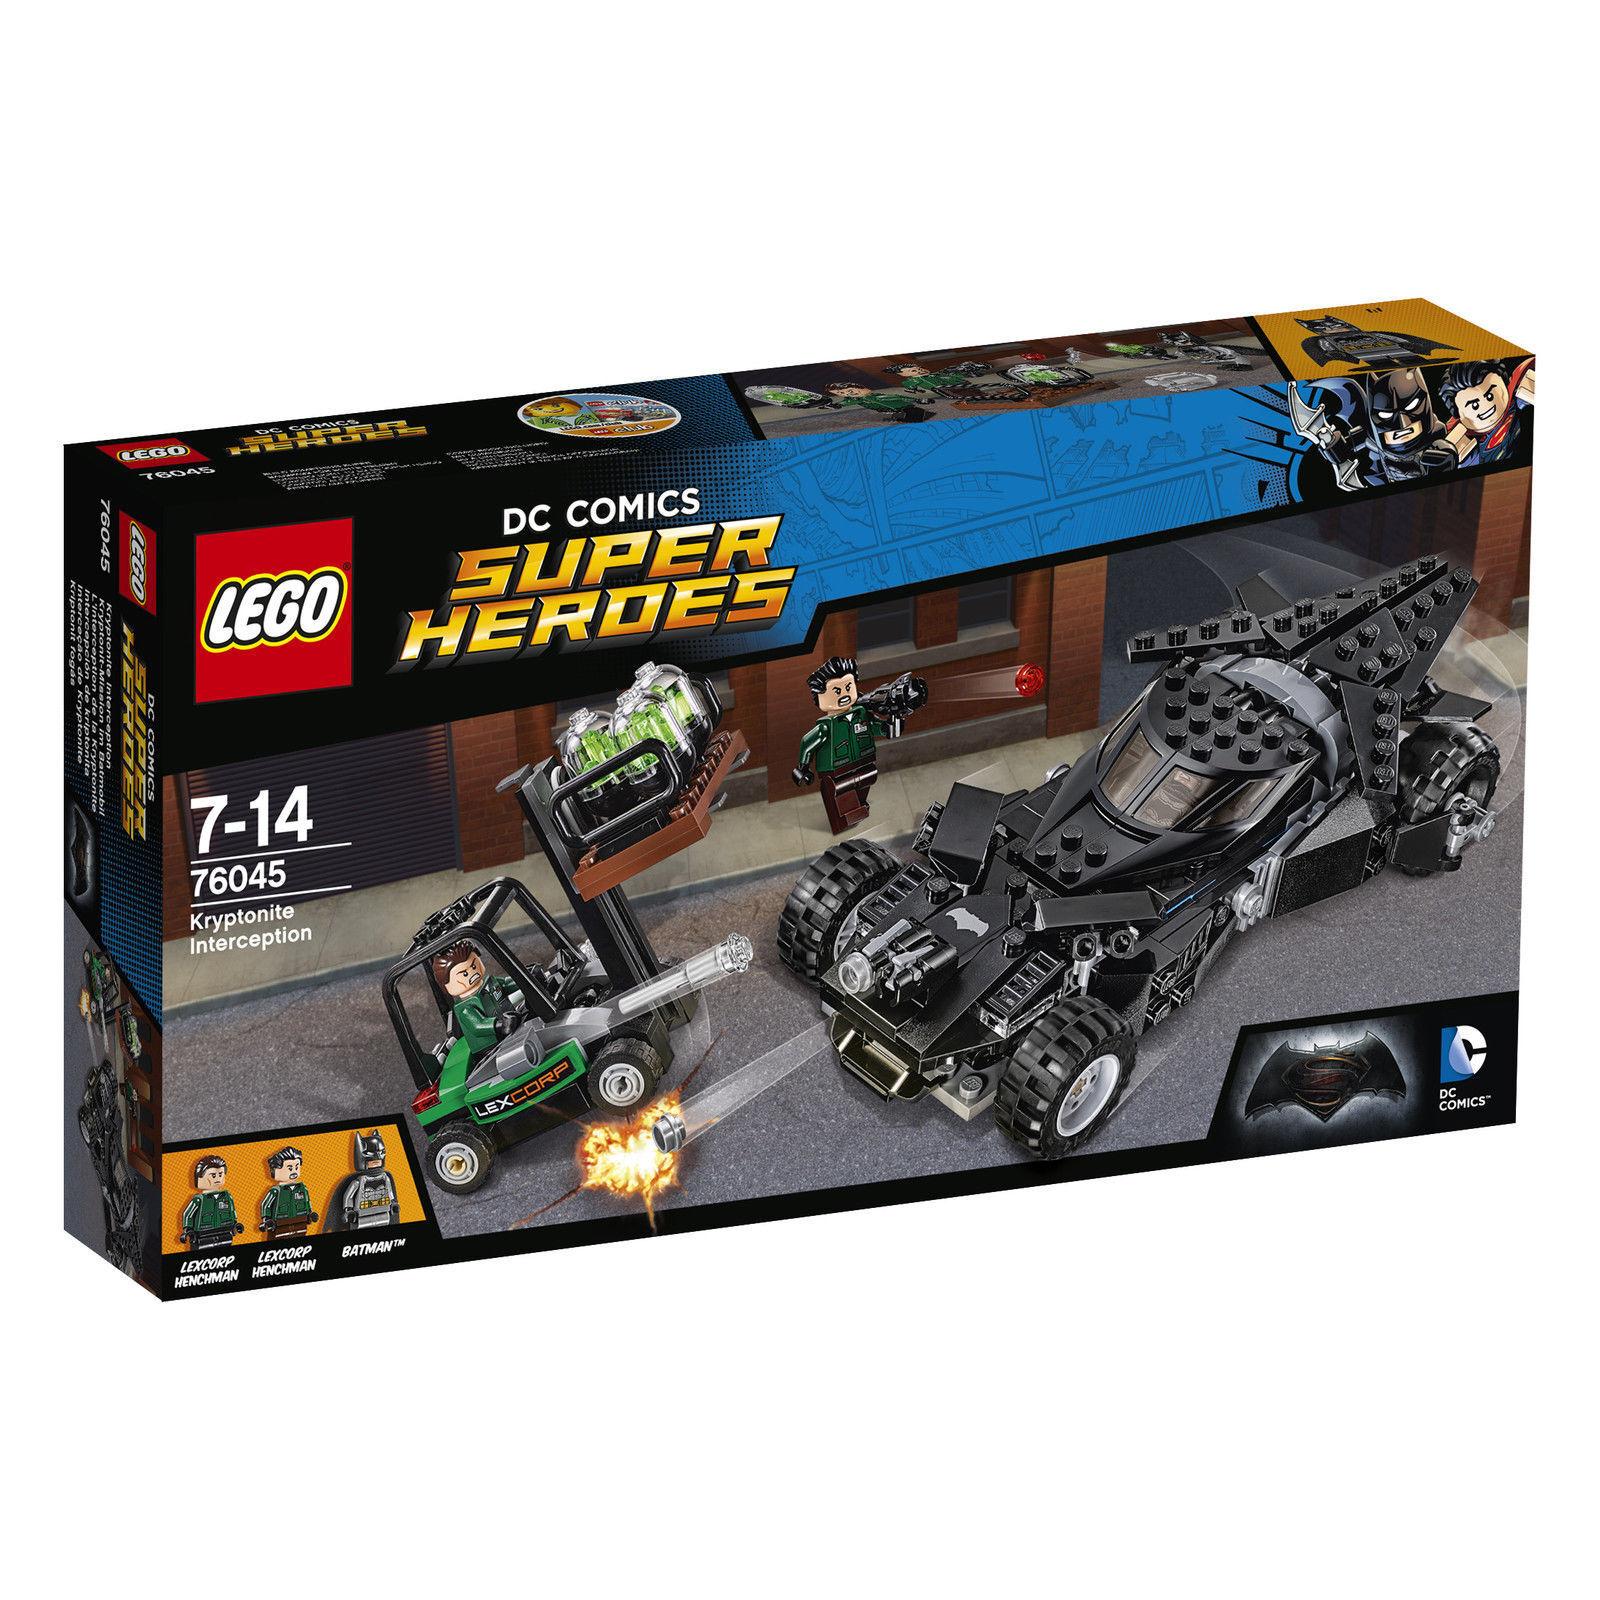 Bat-Dünenbuggy LEGO® The Batman Movie 70918 Brandneu versiegelt